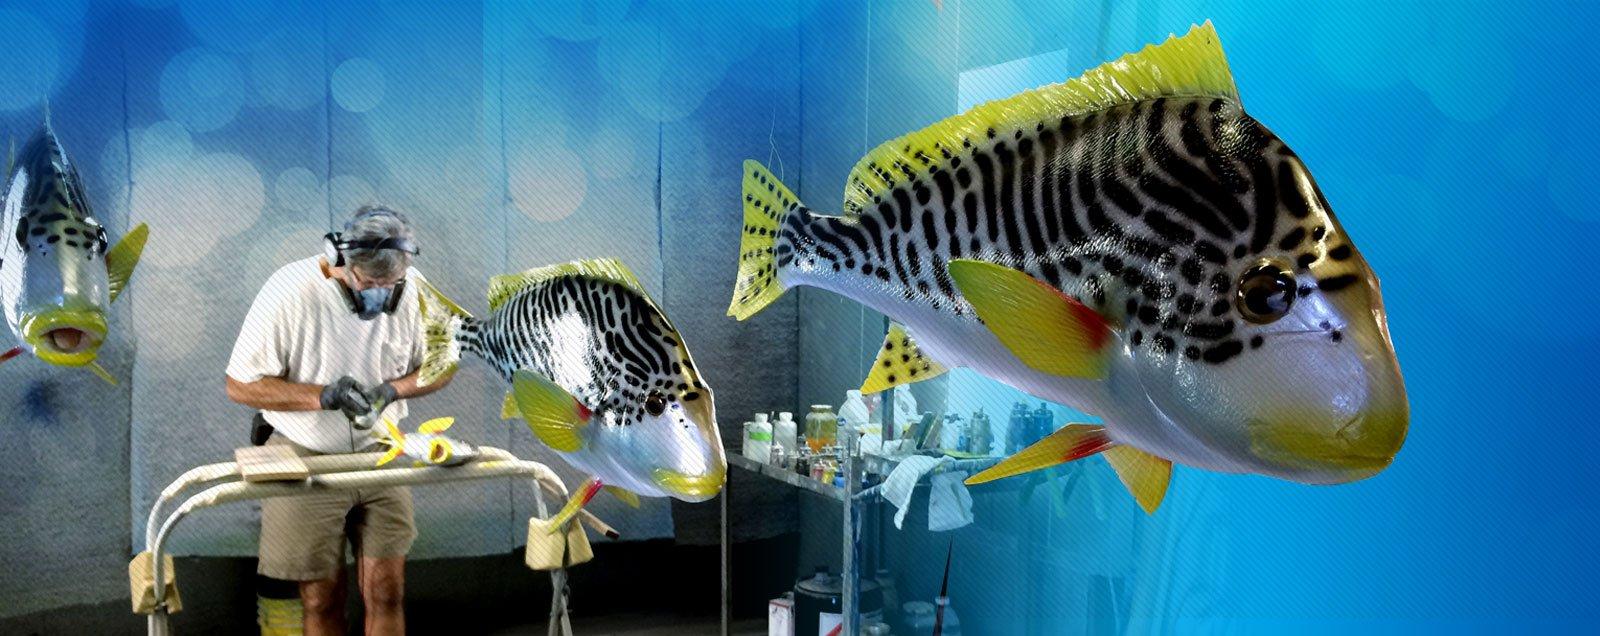 Mike Kirkhart Painting Fish Replicas